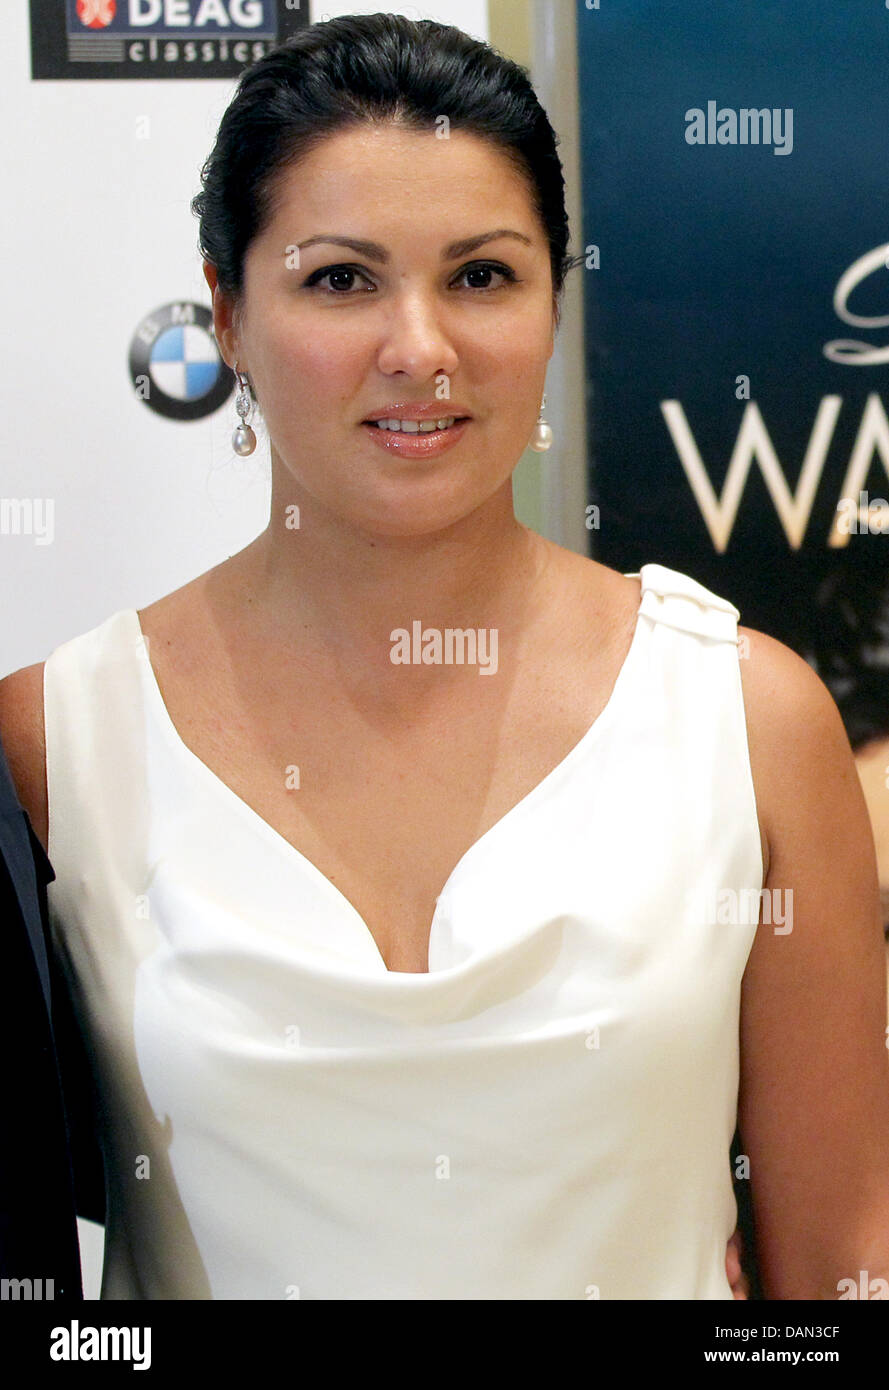 Anna Netrebkos fiance liked Russian celebrities 11/19/2014